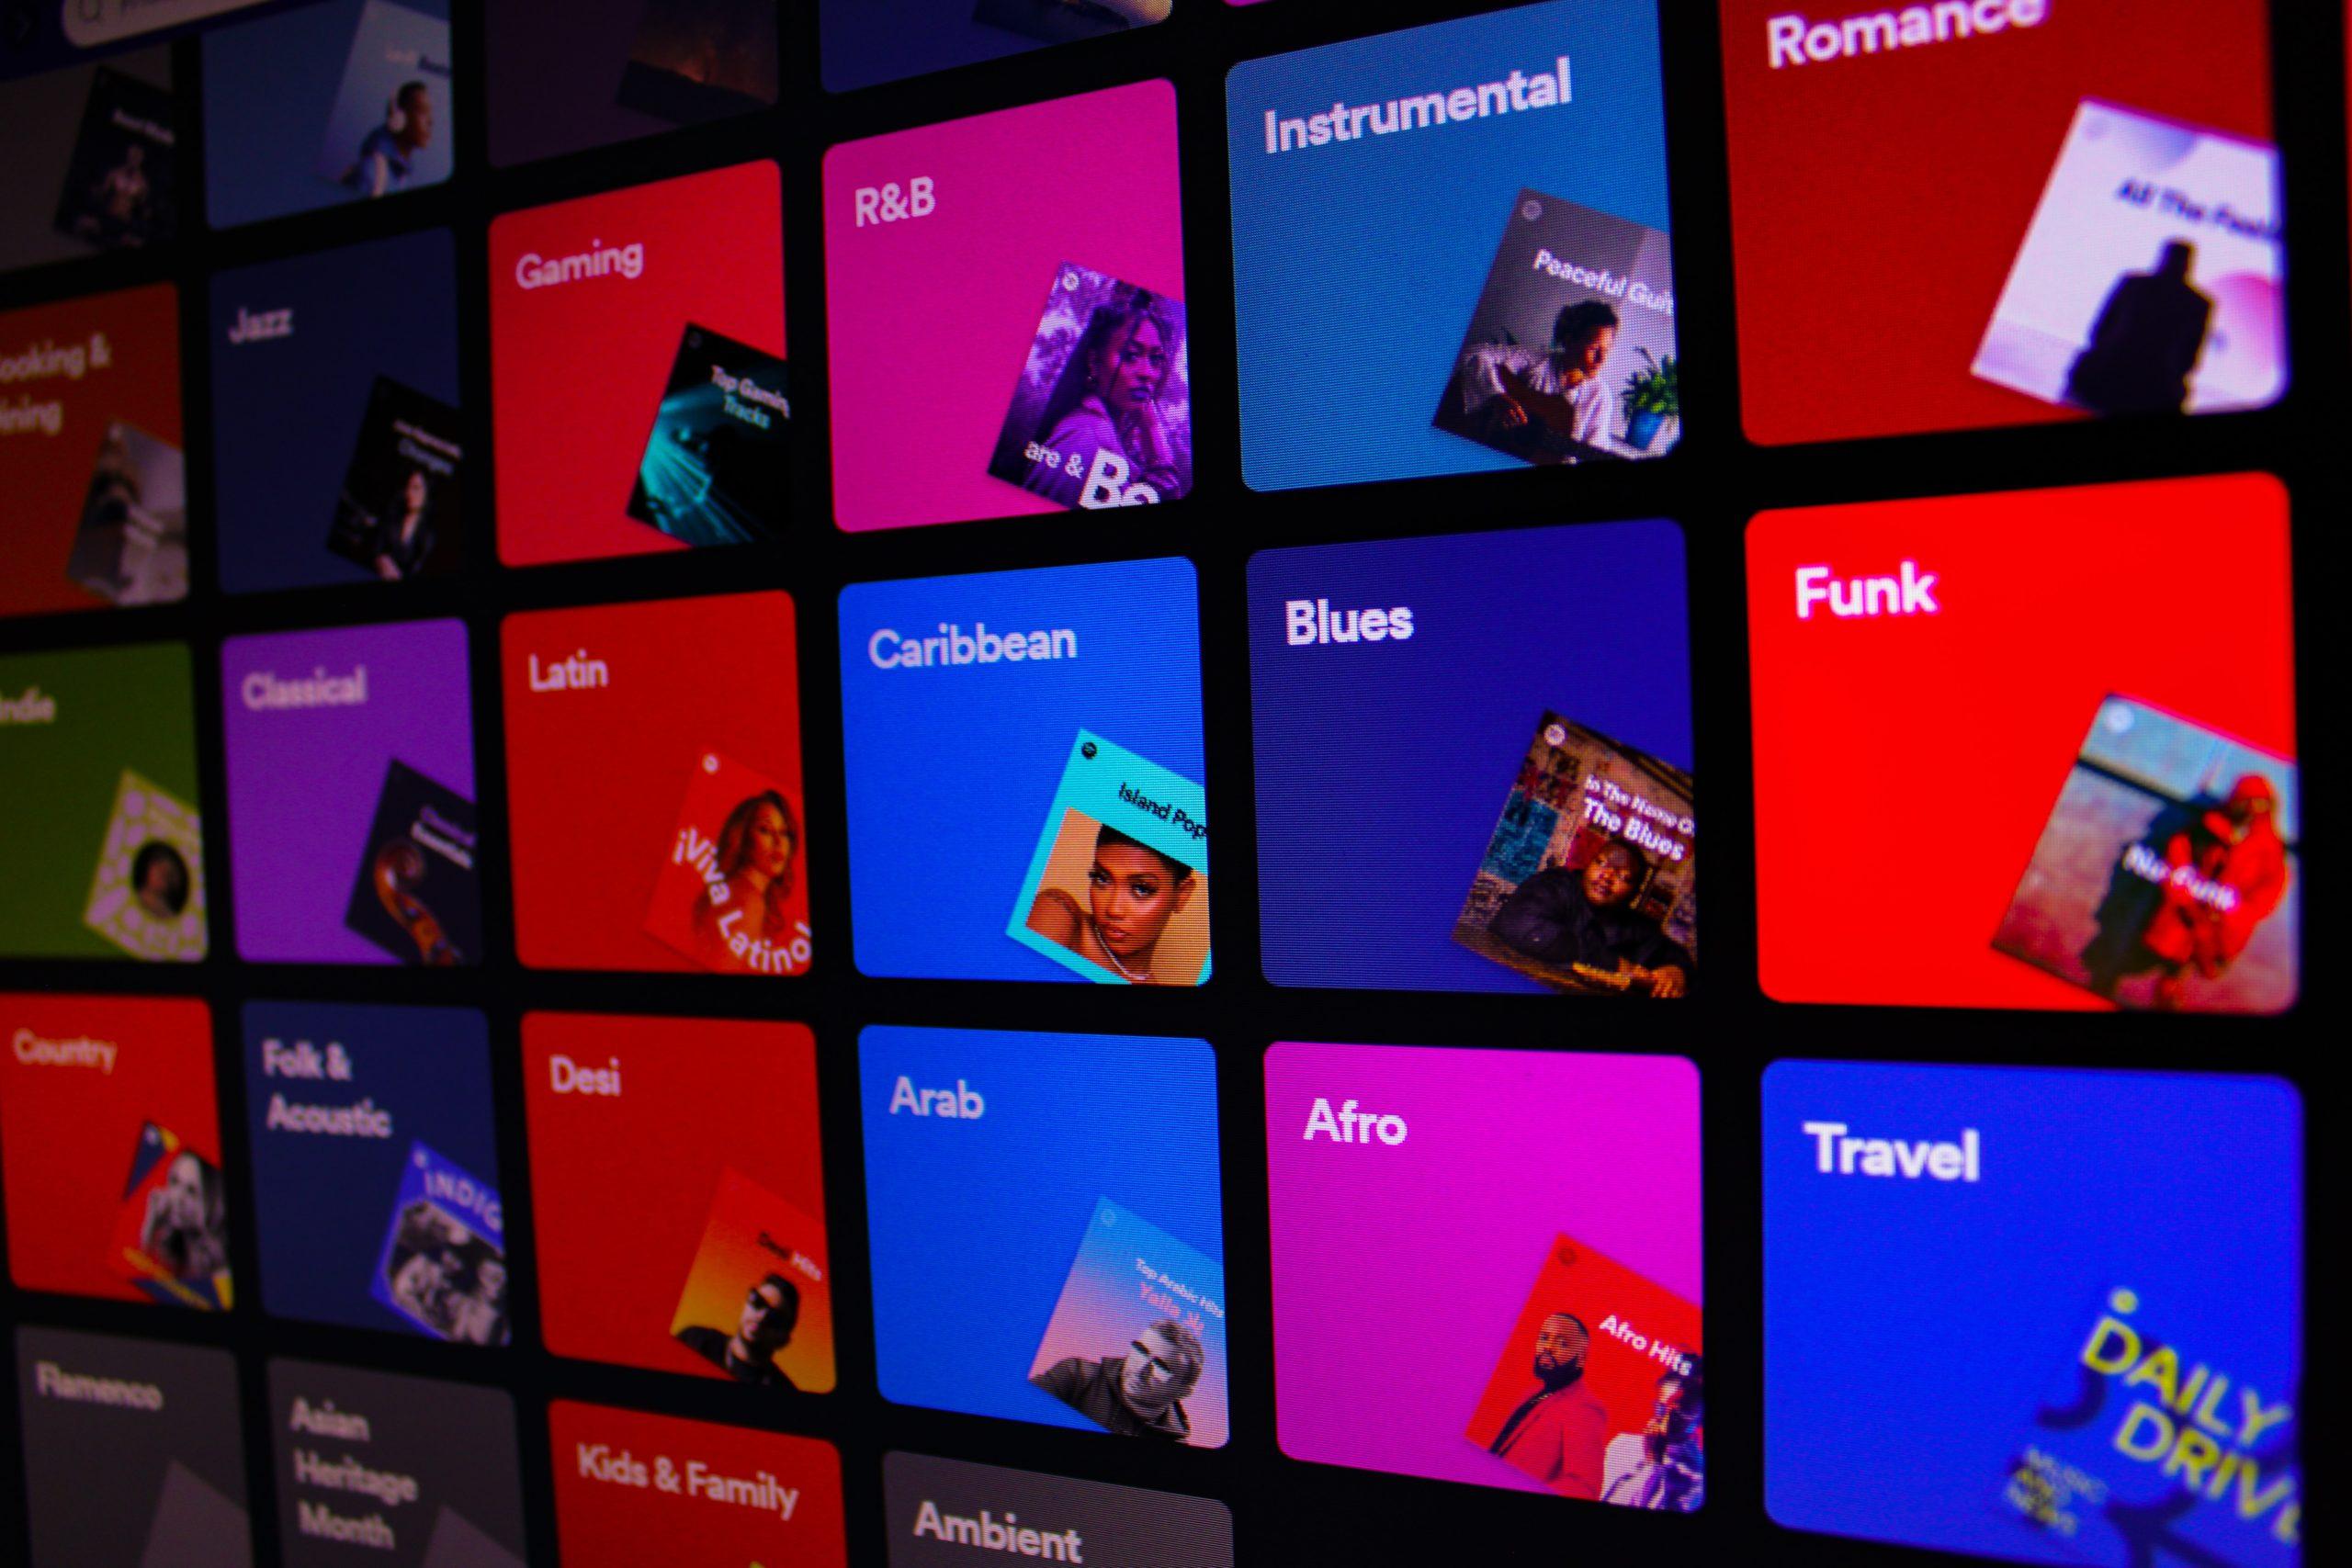 Image of Spotify genre screen